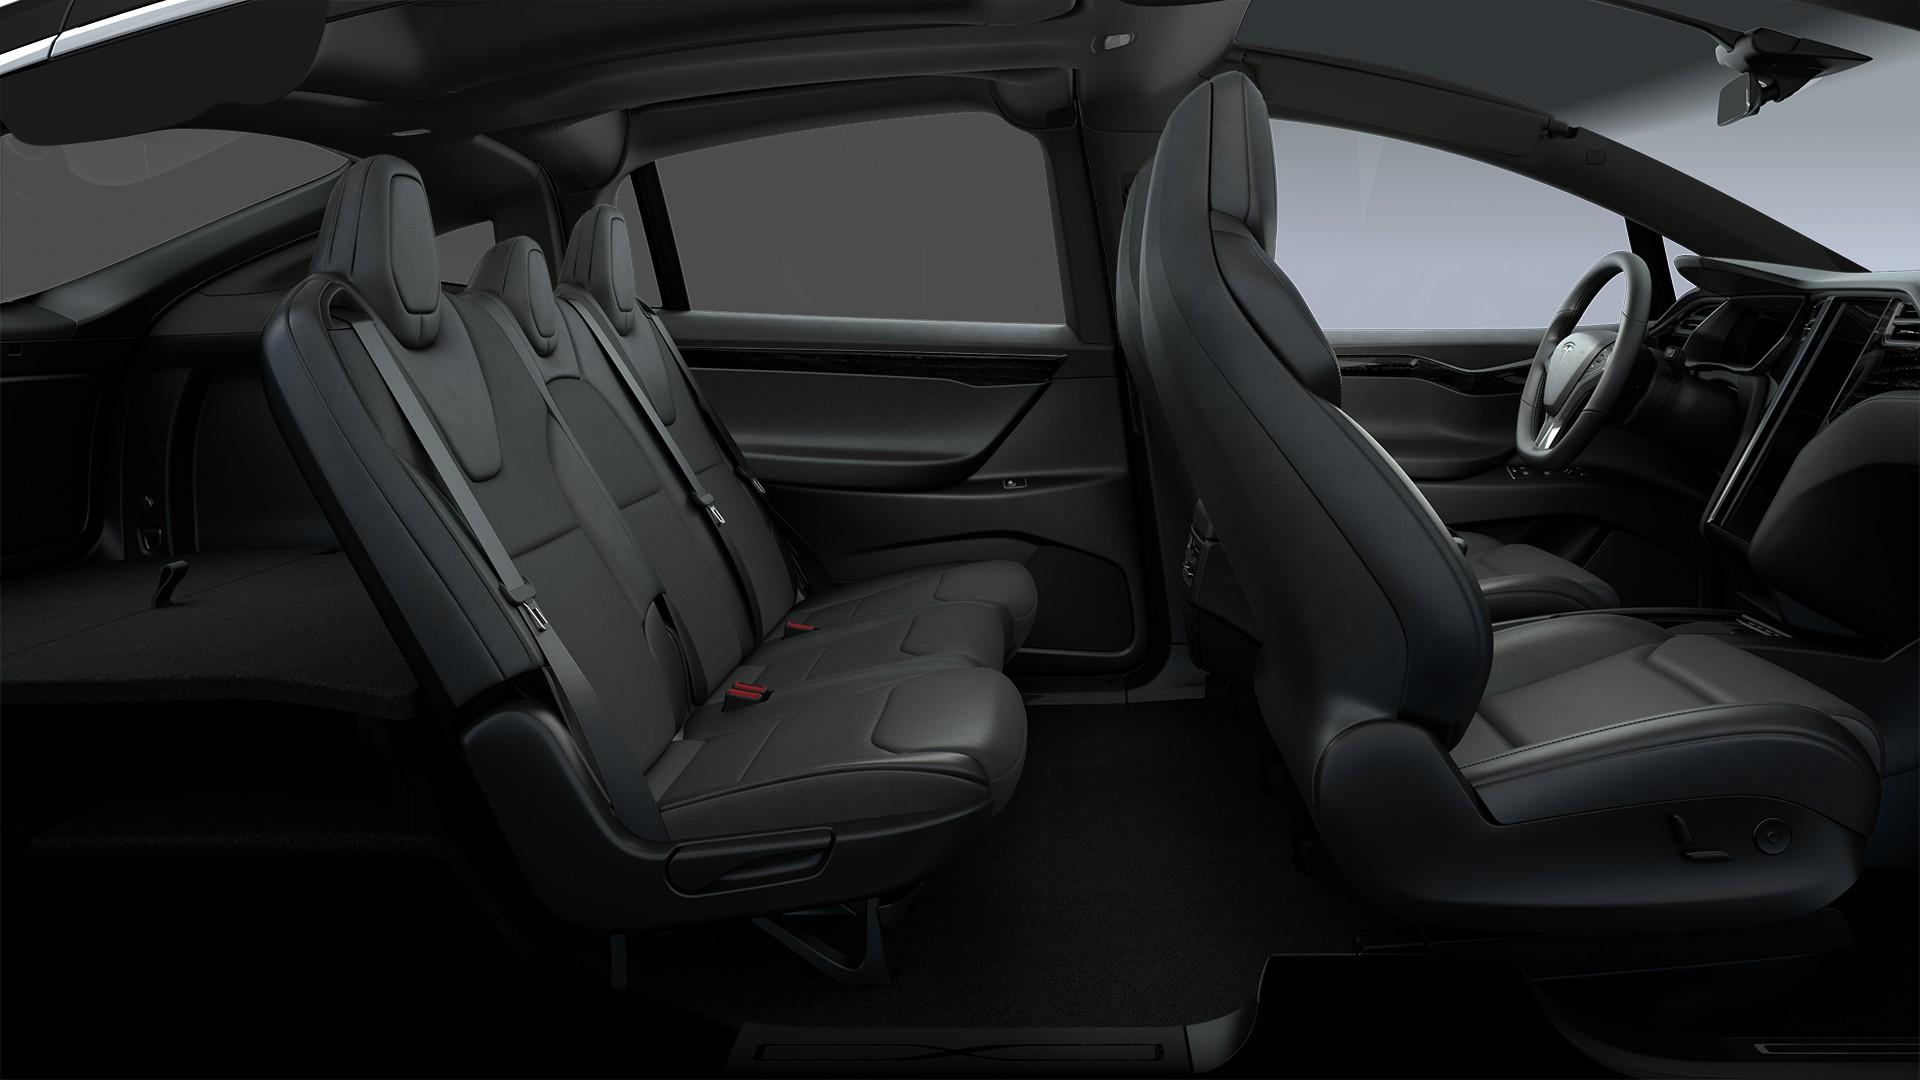 Interieur Black Textile Interior (Multi-Pattern Black) Five Seat Interior Black Textile Interior Dark Ash Wood Decor Dark Headliner